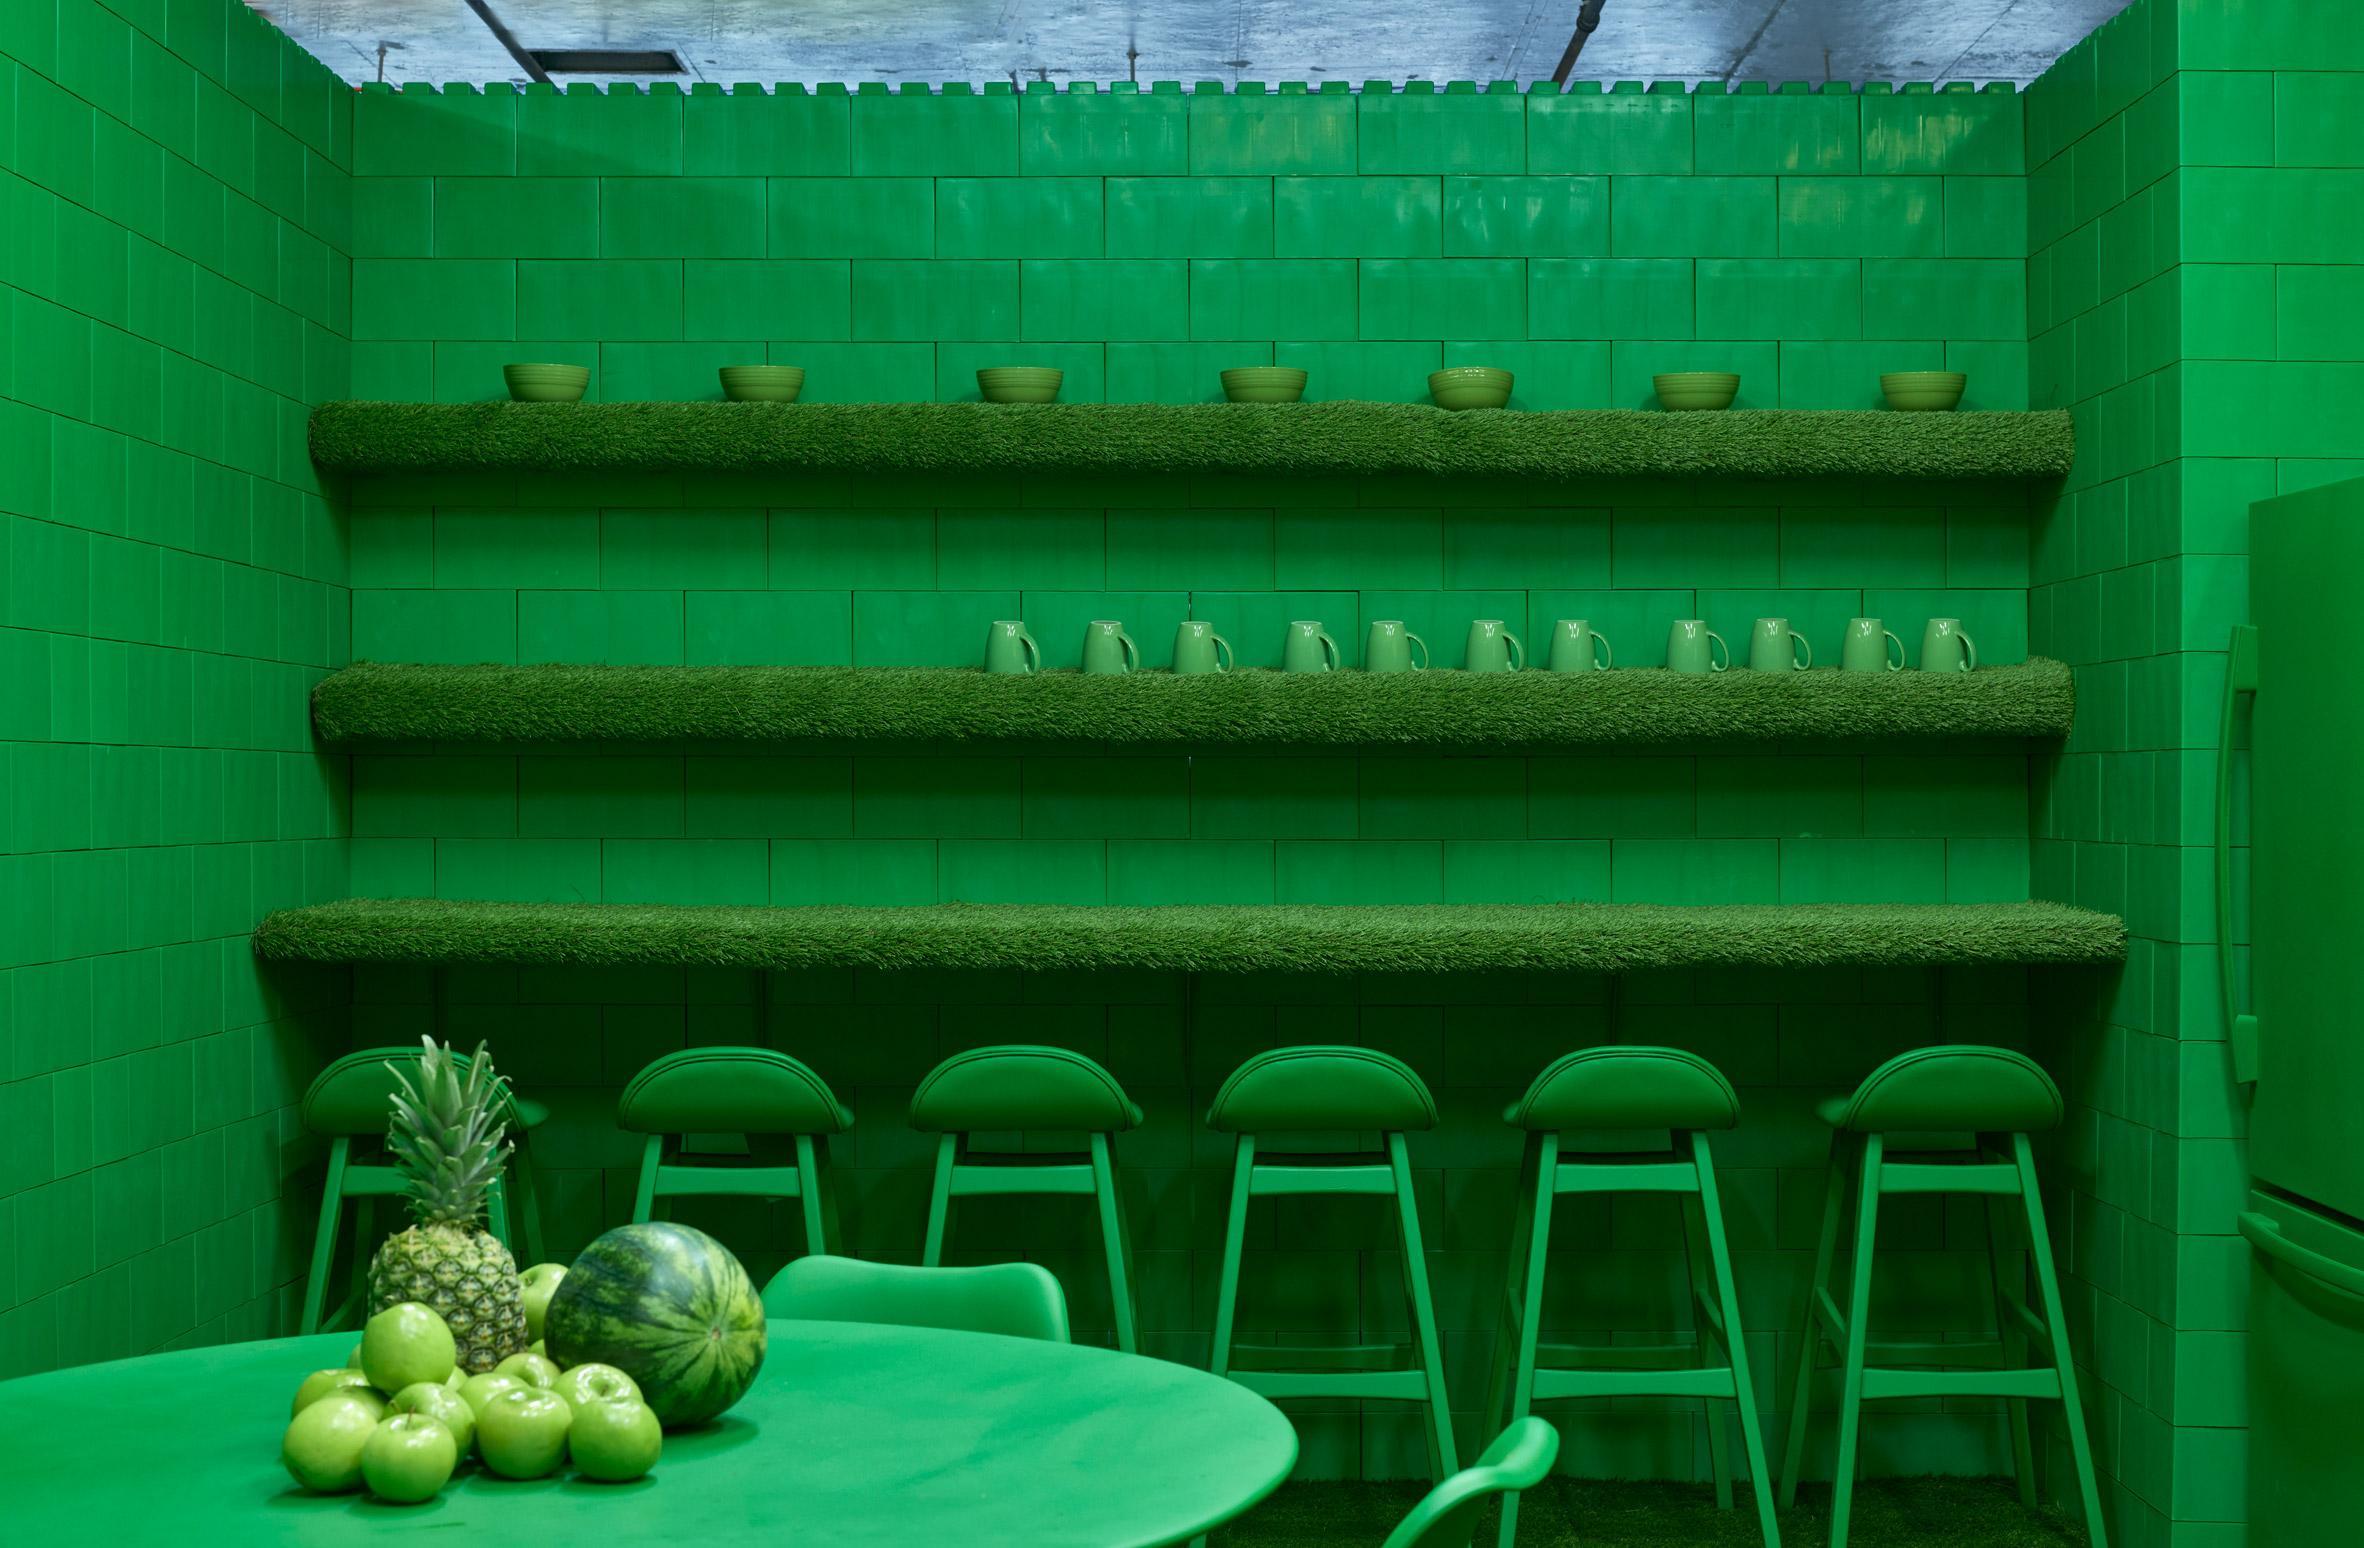 monochrome-cj-hendry-brooklyn-exhibition-colour-rooms-new-york-usa_dezeen_2364_col_27.jpg